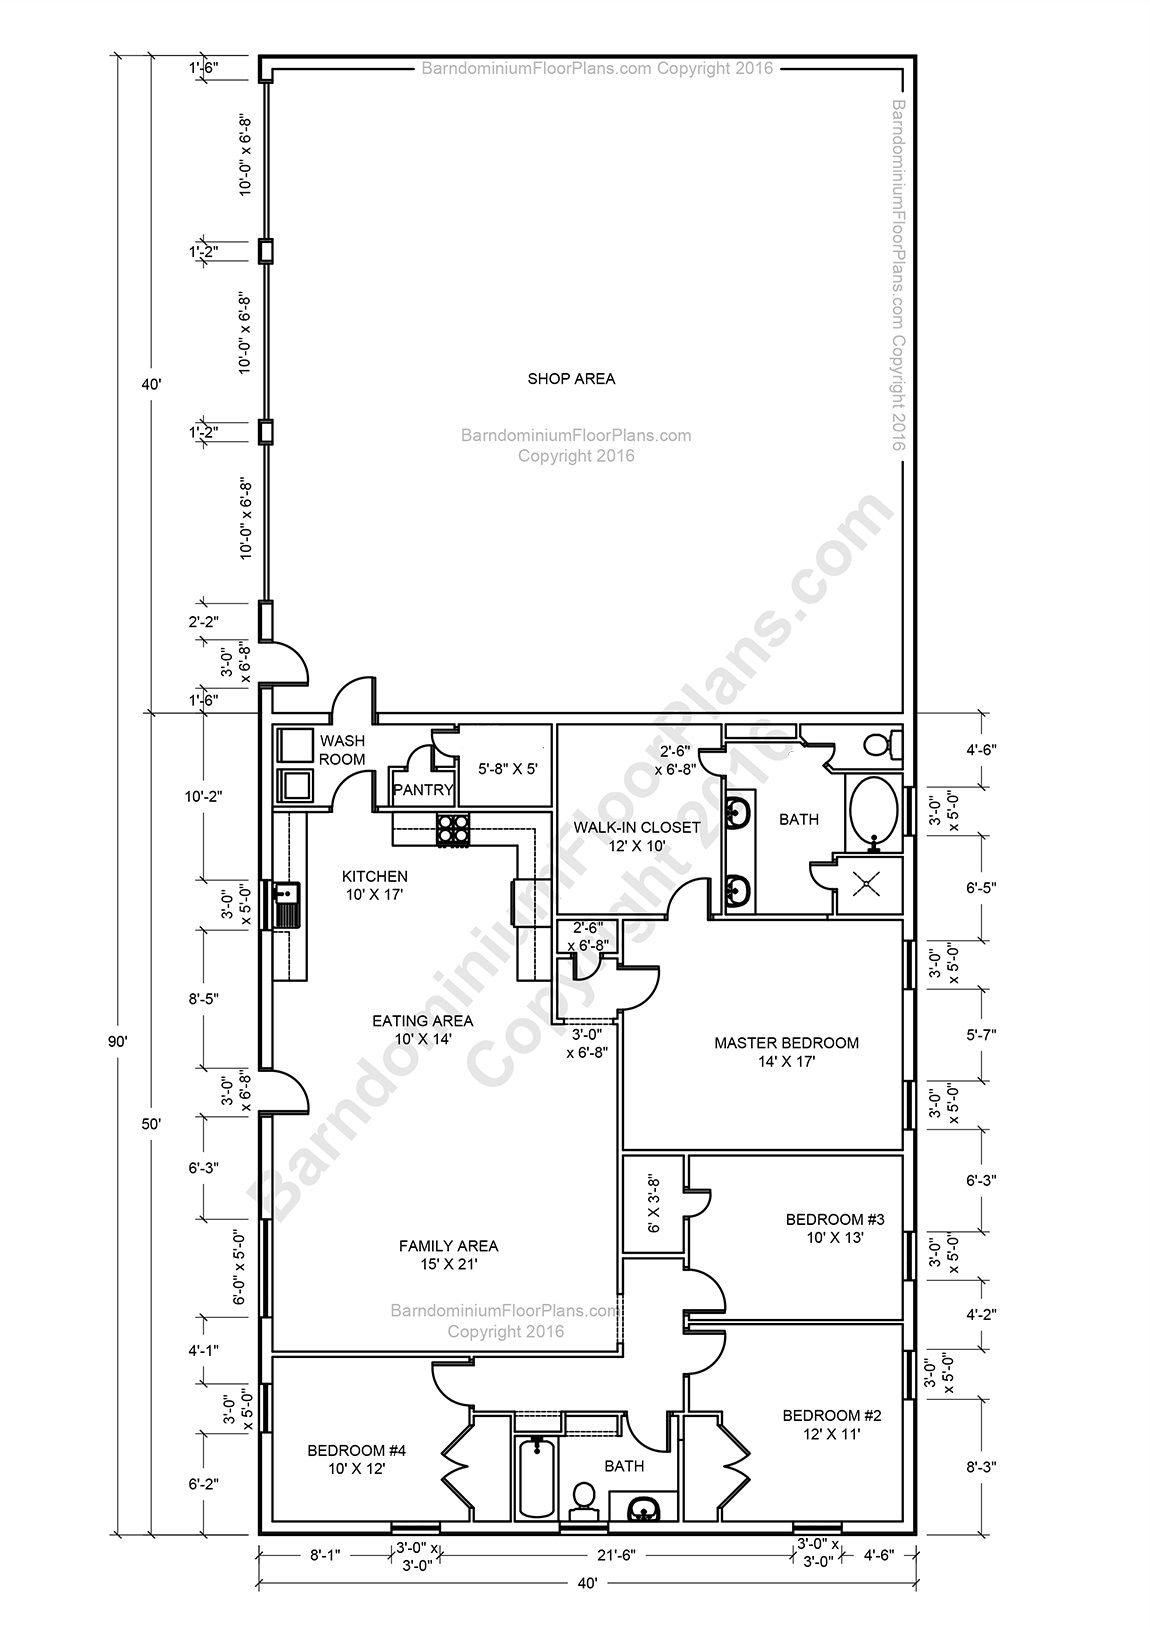 Barndominium Floor Plans, Pole Barn House Plans And Metal pertaining to Barndominium Floor Plans 5 Bedroom